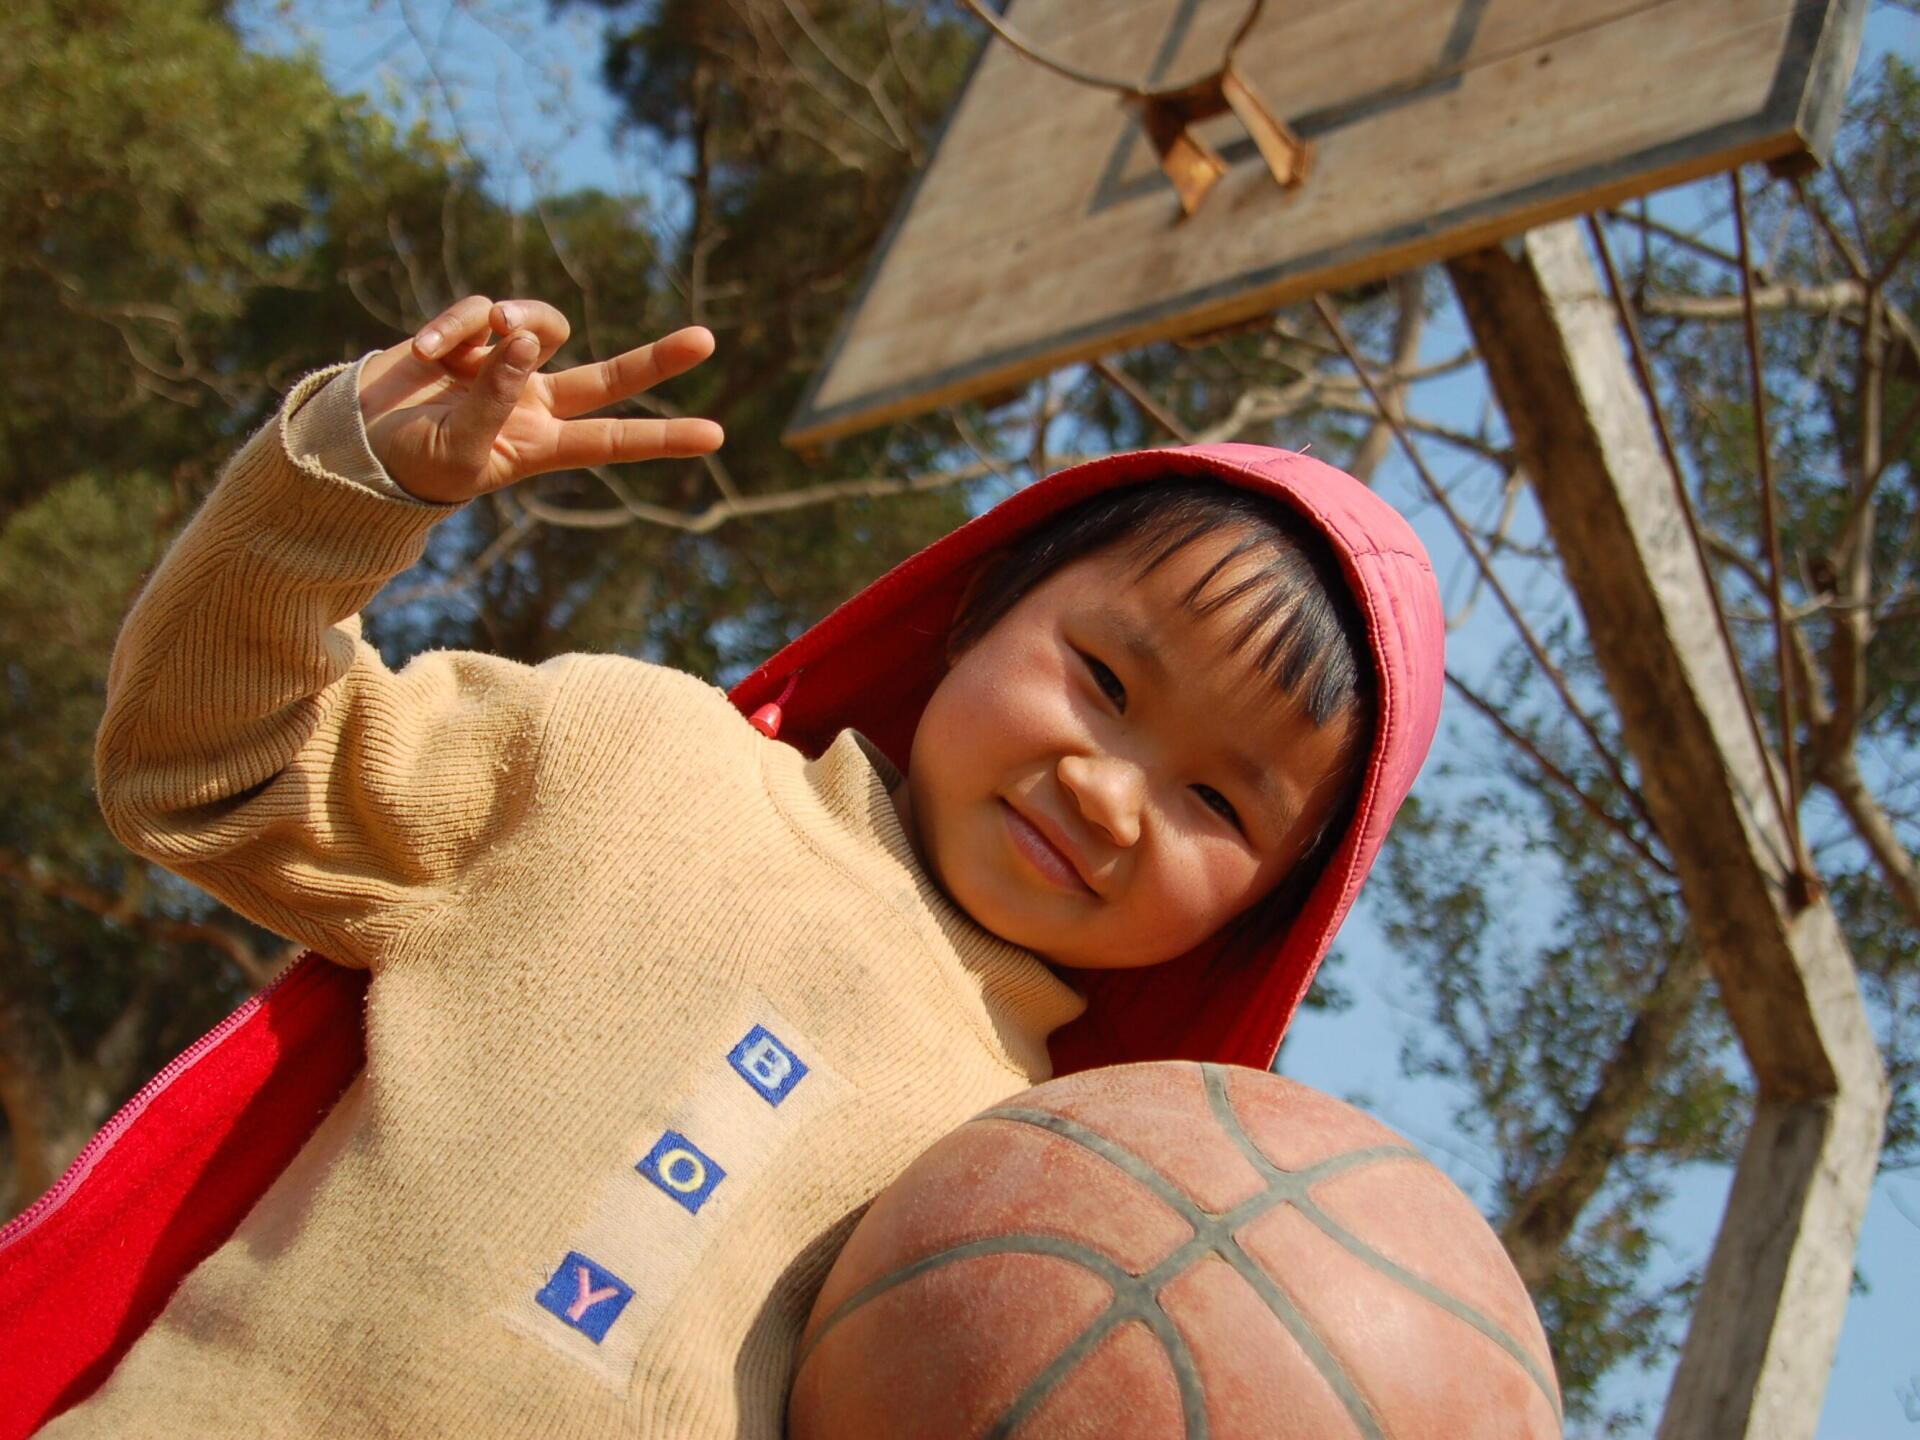 projet fondation decathlon shanghai chine